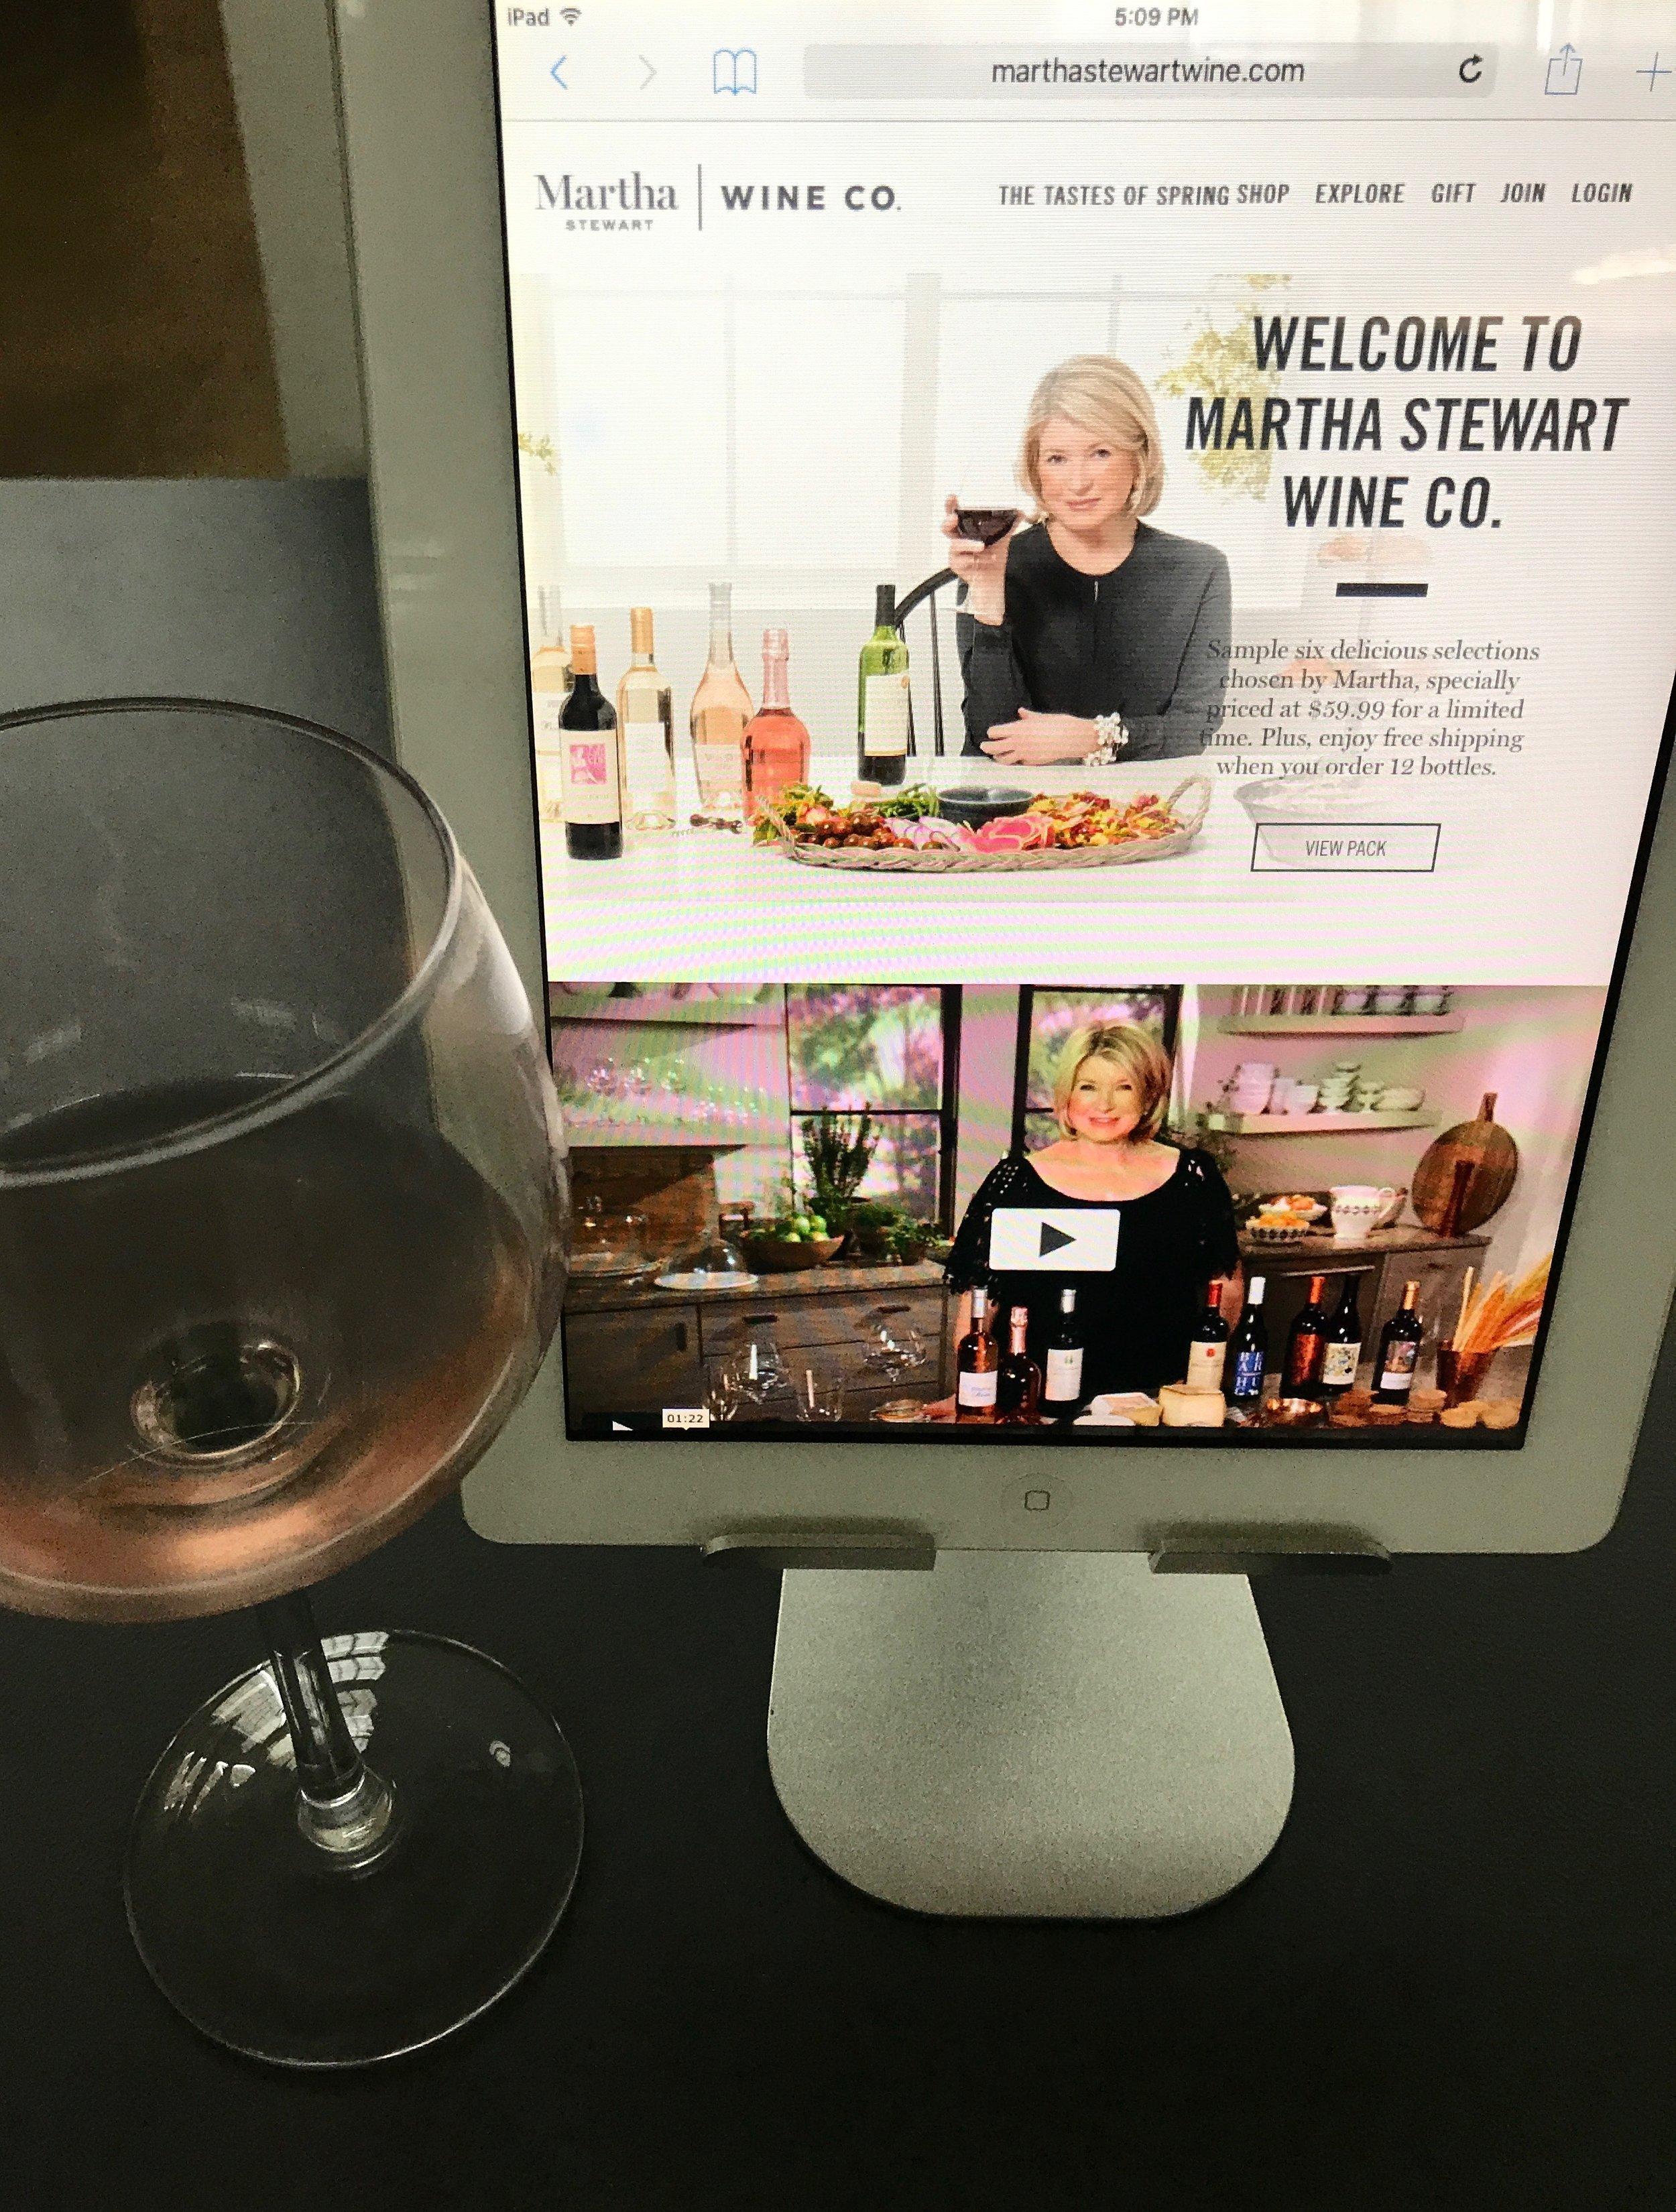 Anna Osgoodby Life + Design NYC Lifestyle Blog : Introducing Martha Stewart Wine Co.